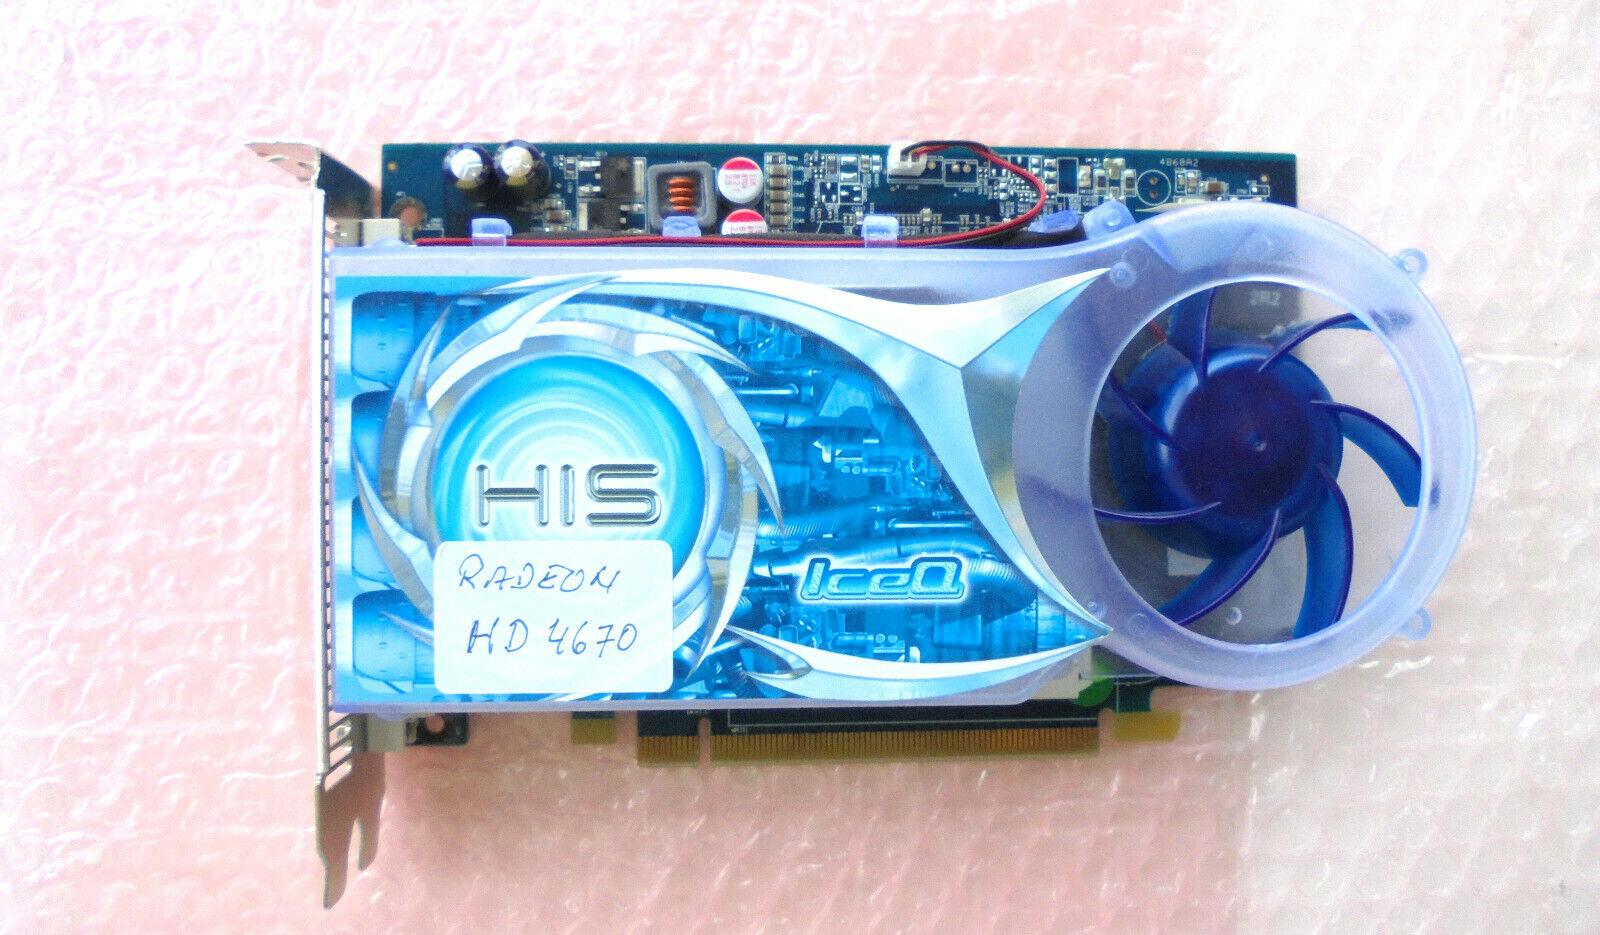 HD 4670 TOP Grafikkarte HIS Radeon 1GB DDR3 PCIe DVI + HDMI Adapter TOP Zustand